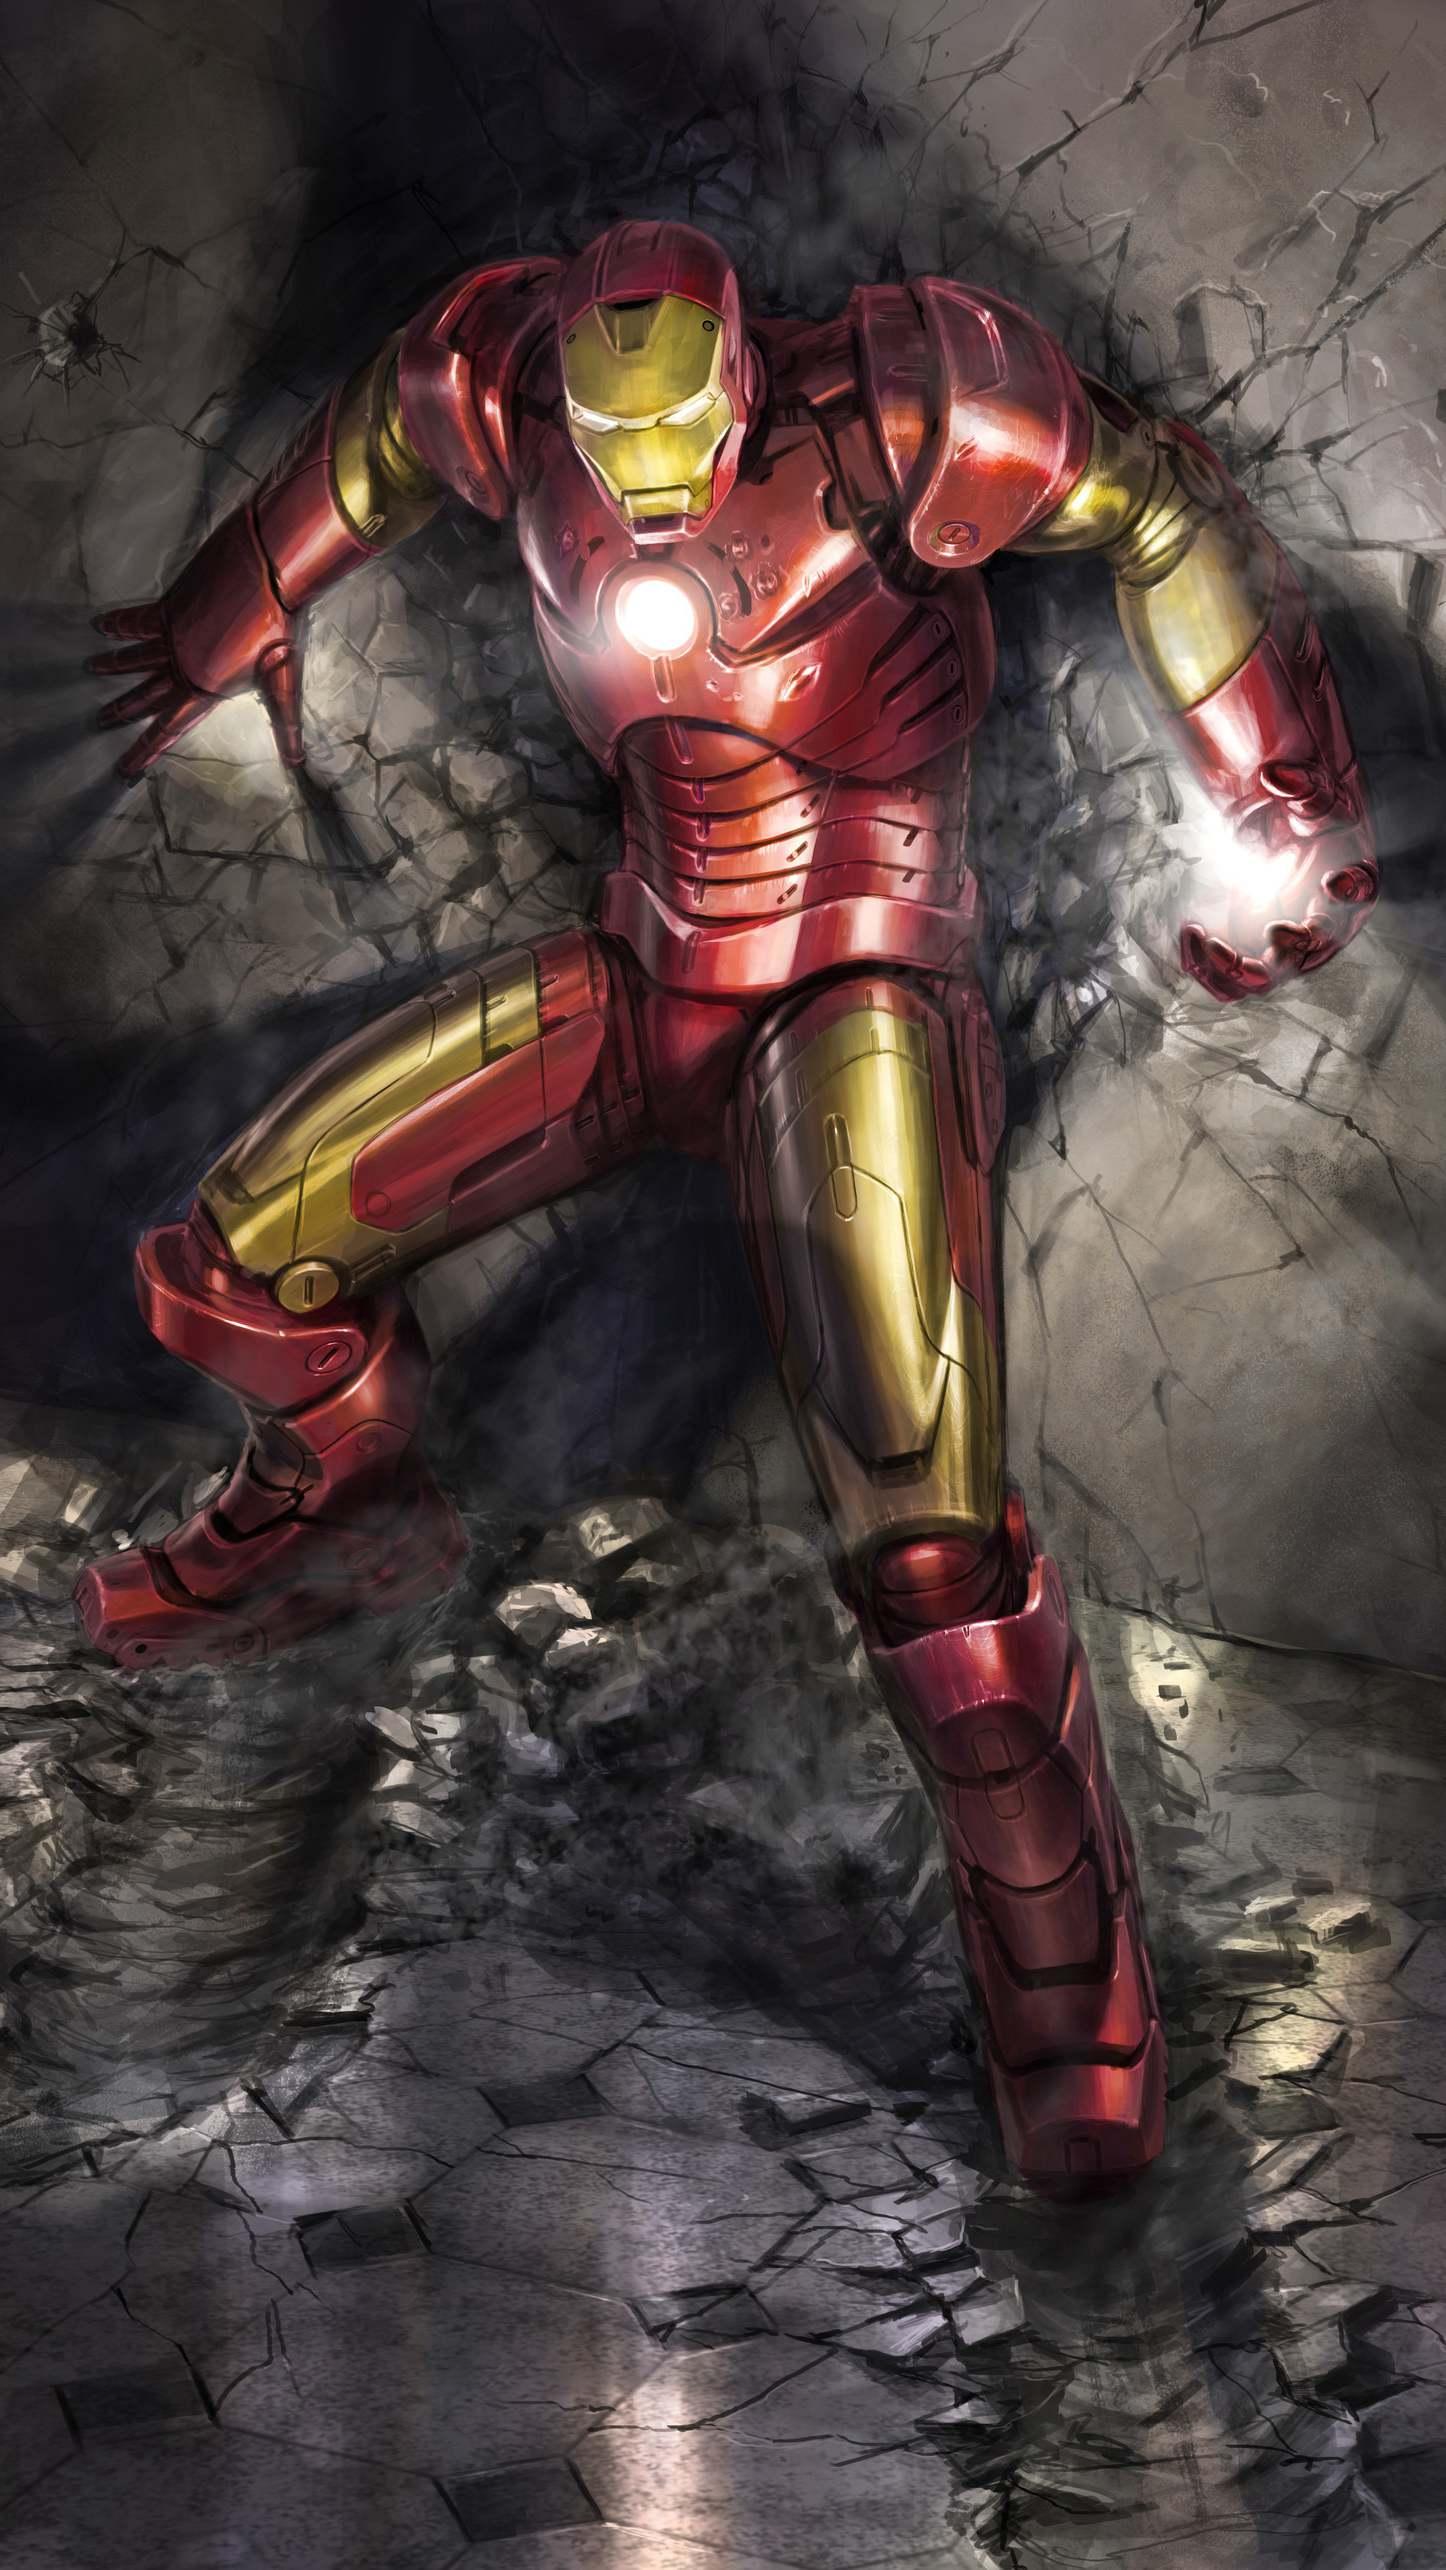 Iron Man Action Art iPhone Wallpaper